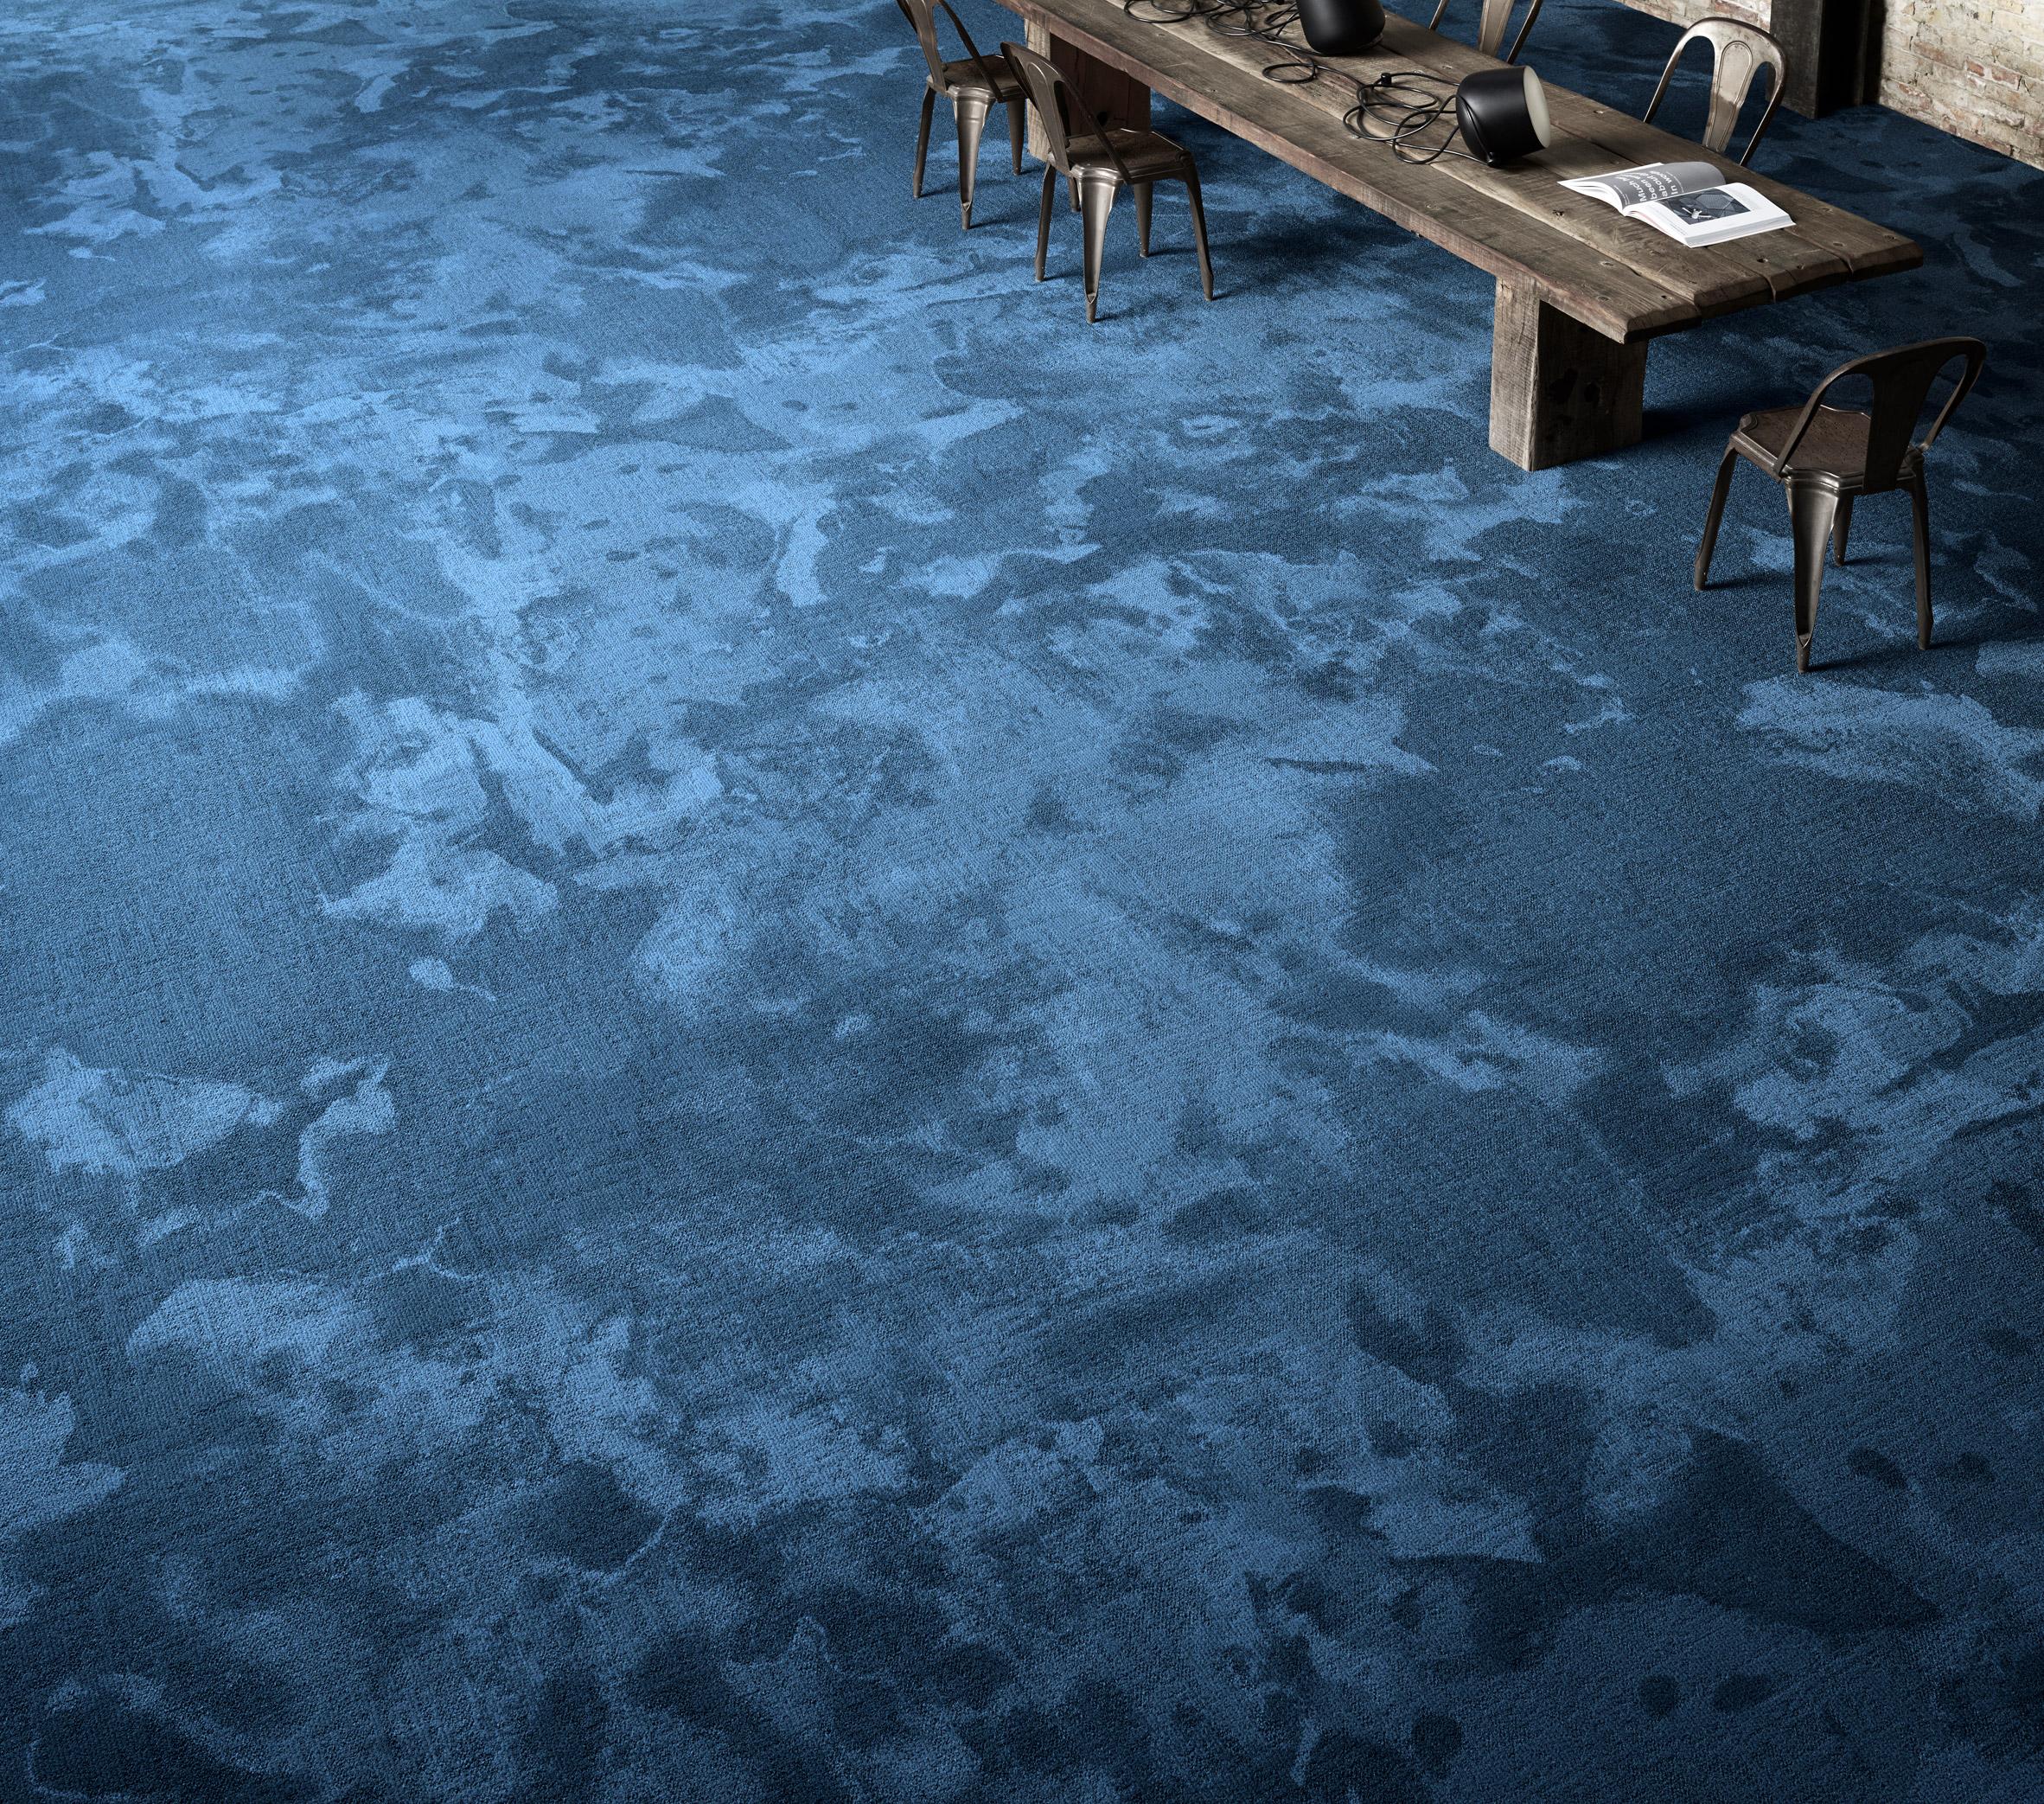 A marble-look blue carpet